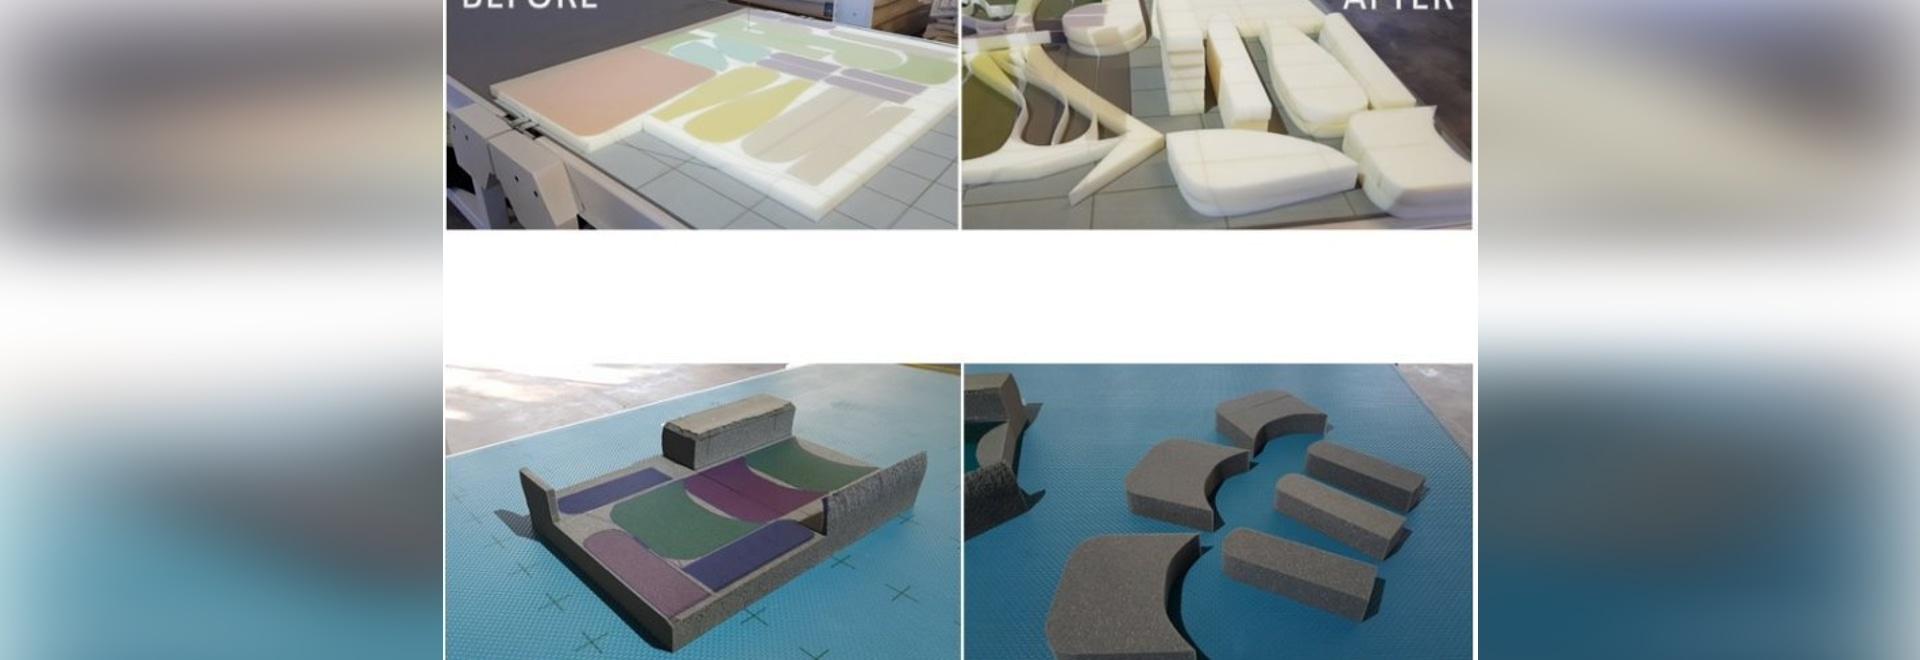 VCR Handy - Ready To Go mini vertical CNC cutting machine for foam